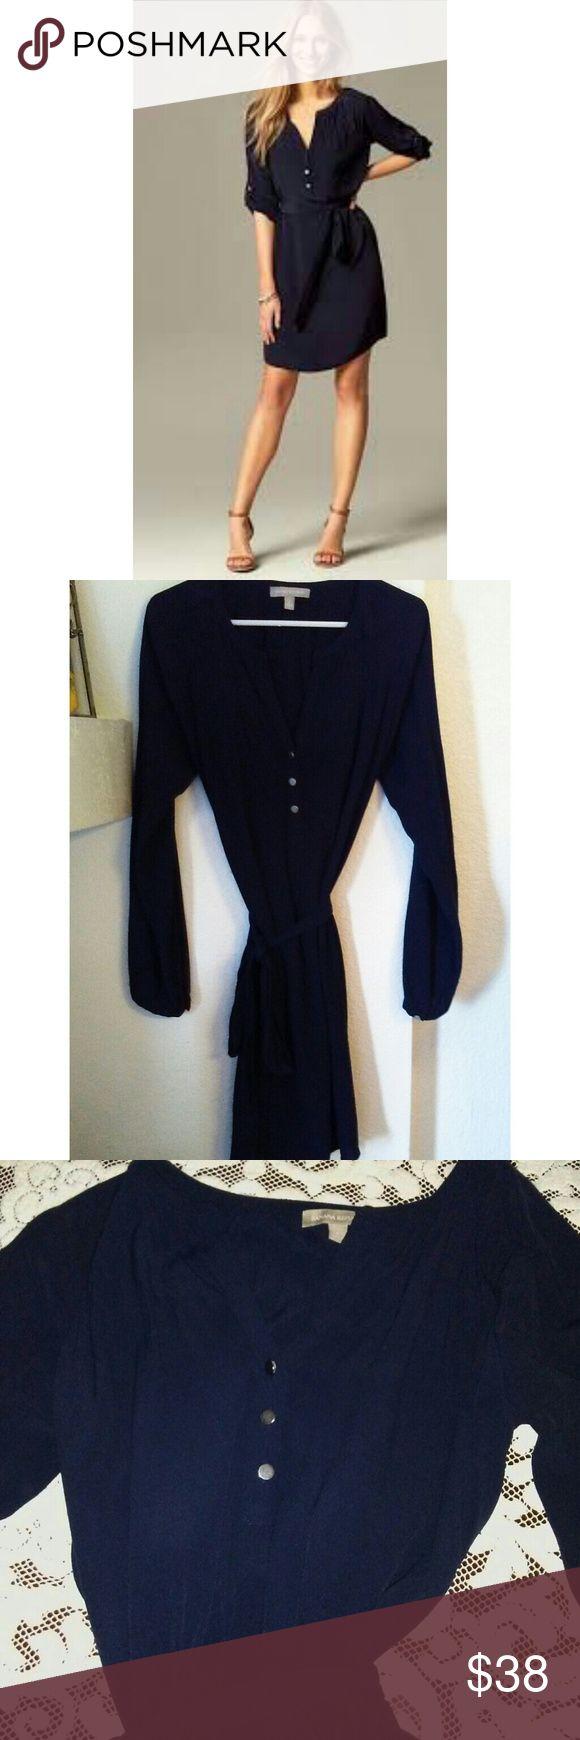 Like New Banana Republic Petite Shirt Dress Like new, Navy Blue convertible sleeve shirt dress.  Includes original matching matching slip. Banana Republic Dresses